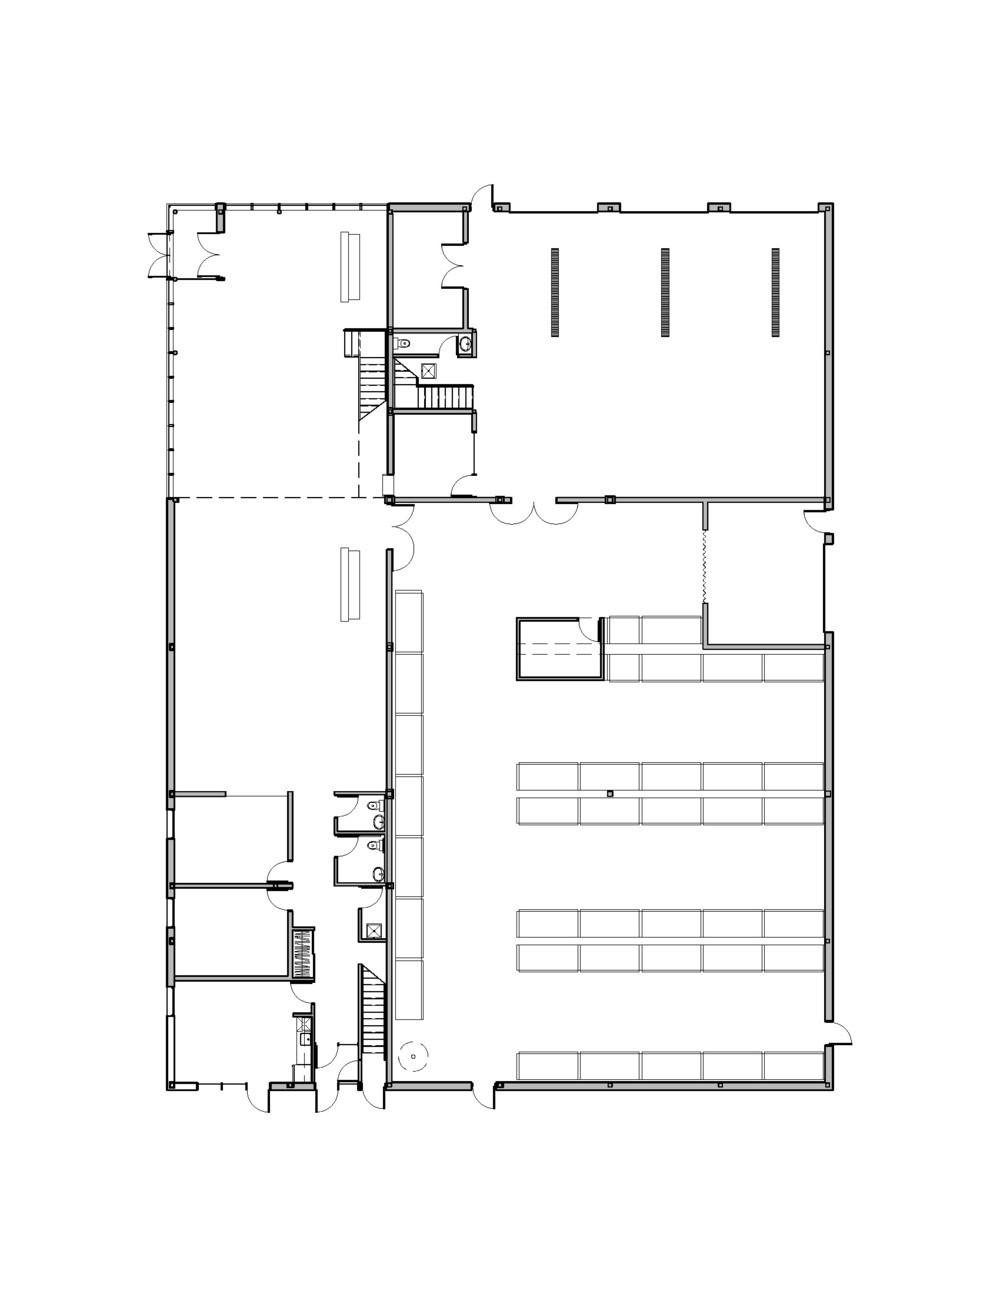 Fournitures Select / Blouin Tardif Architecture-Environnement